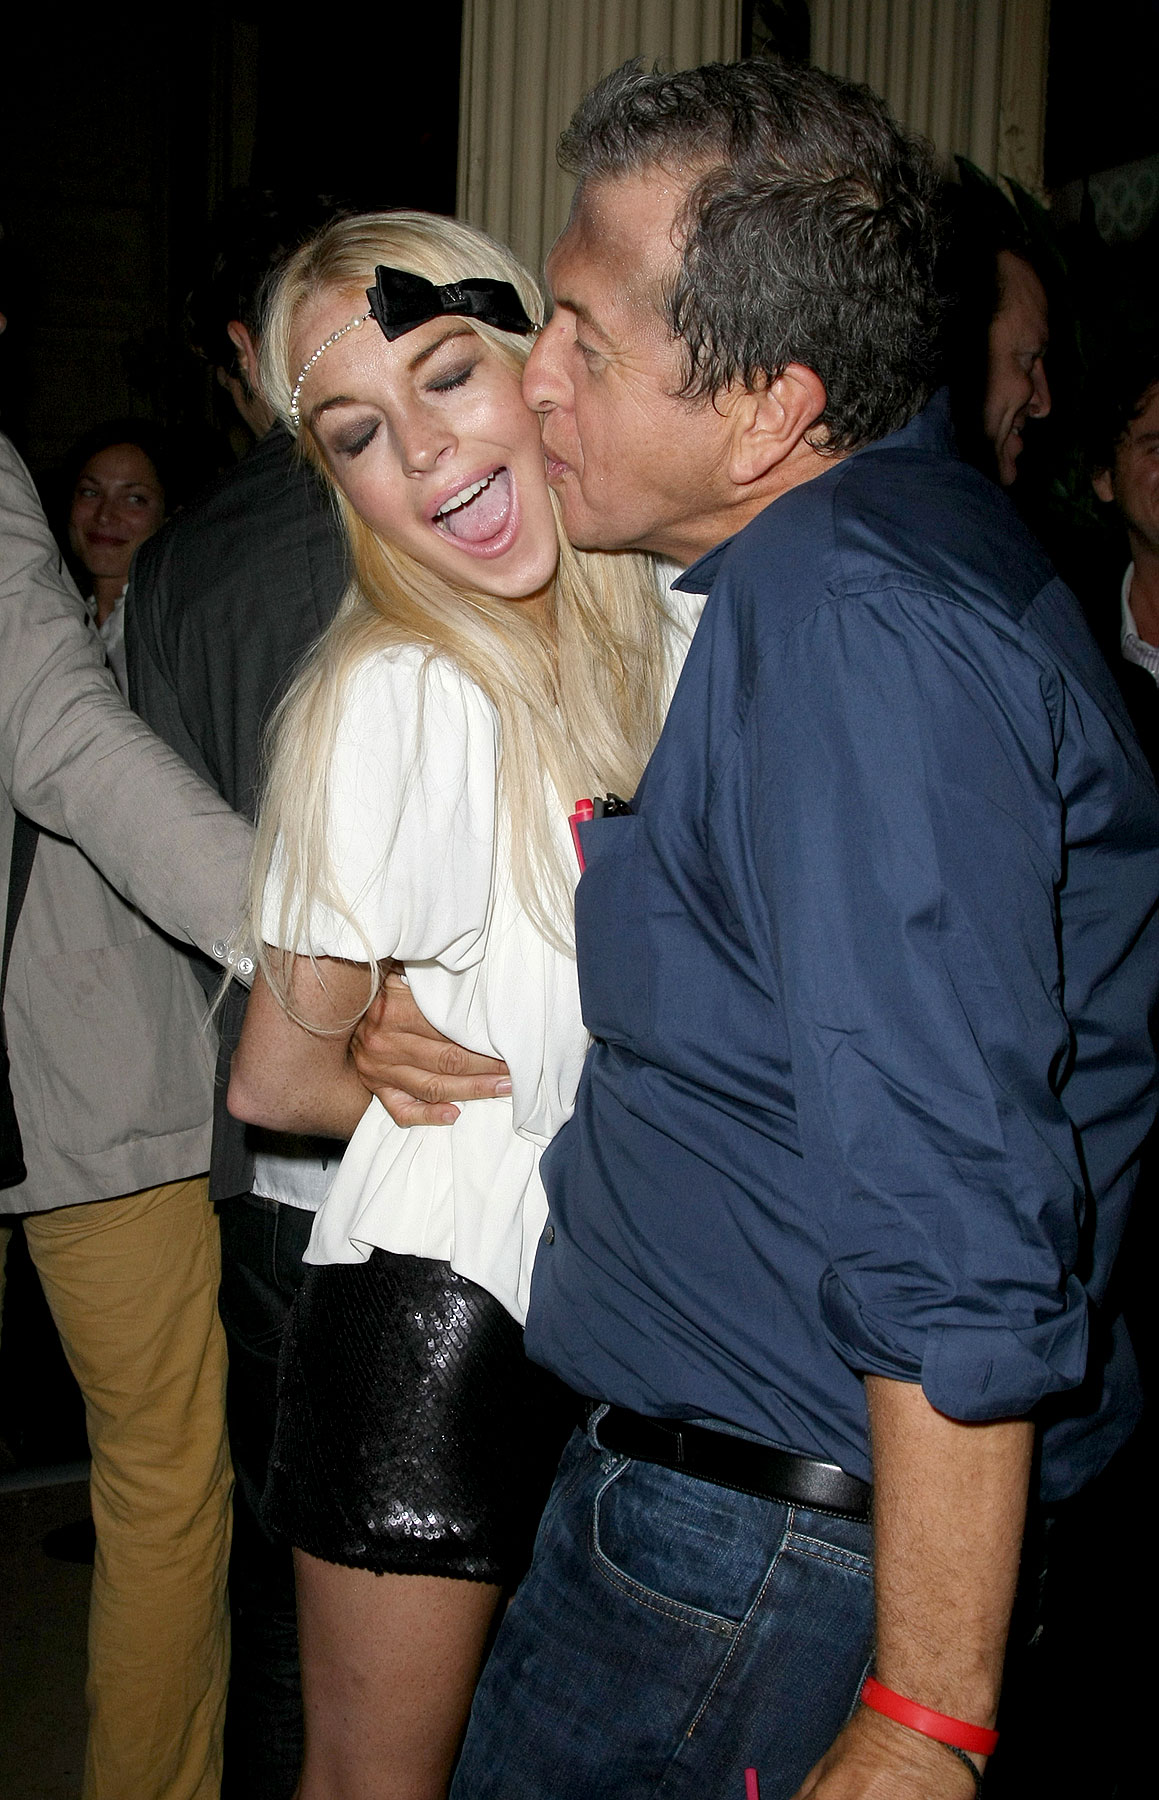 PHOTO GALLERY: Lindsay Lohan Parties in Paris